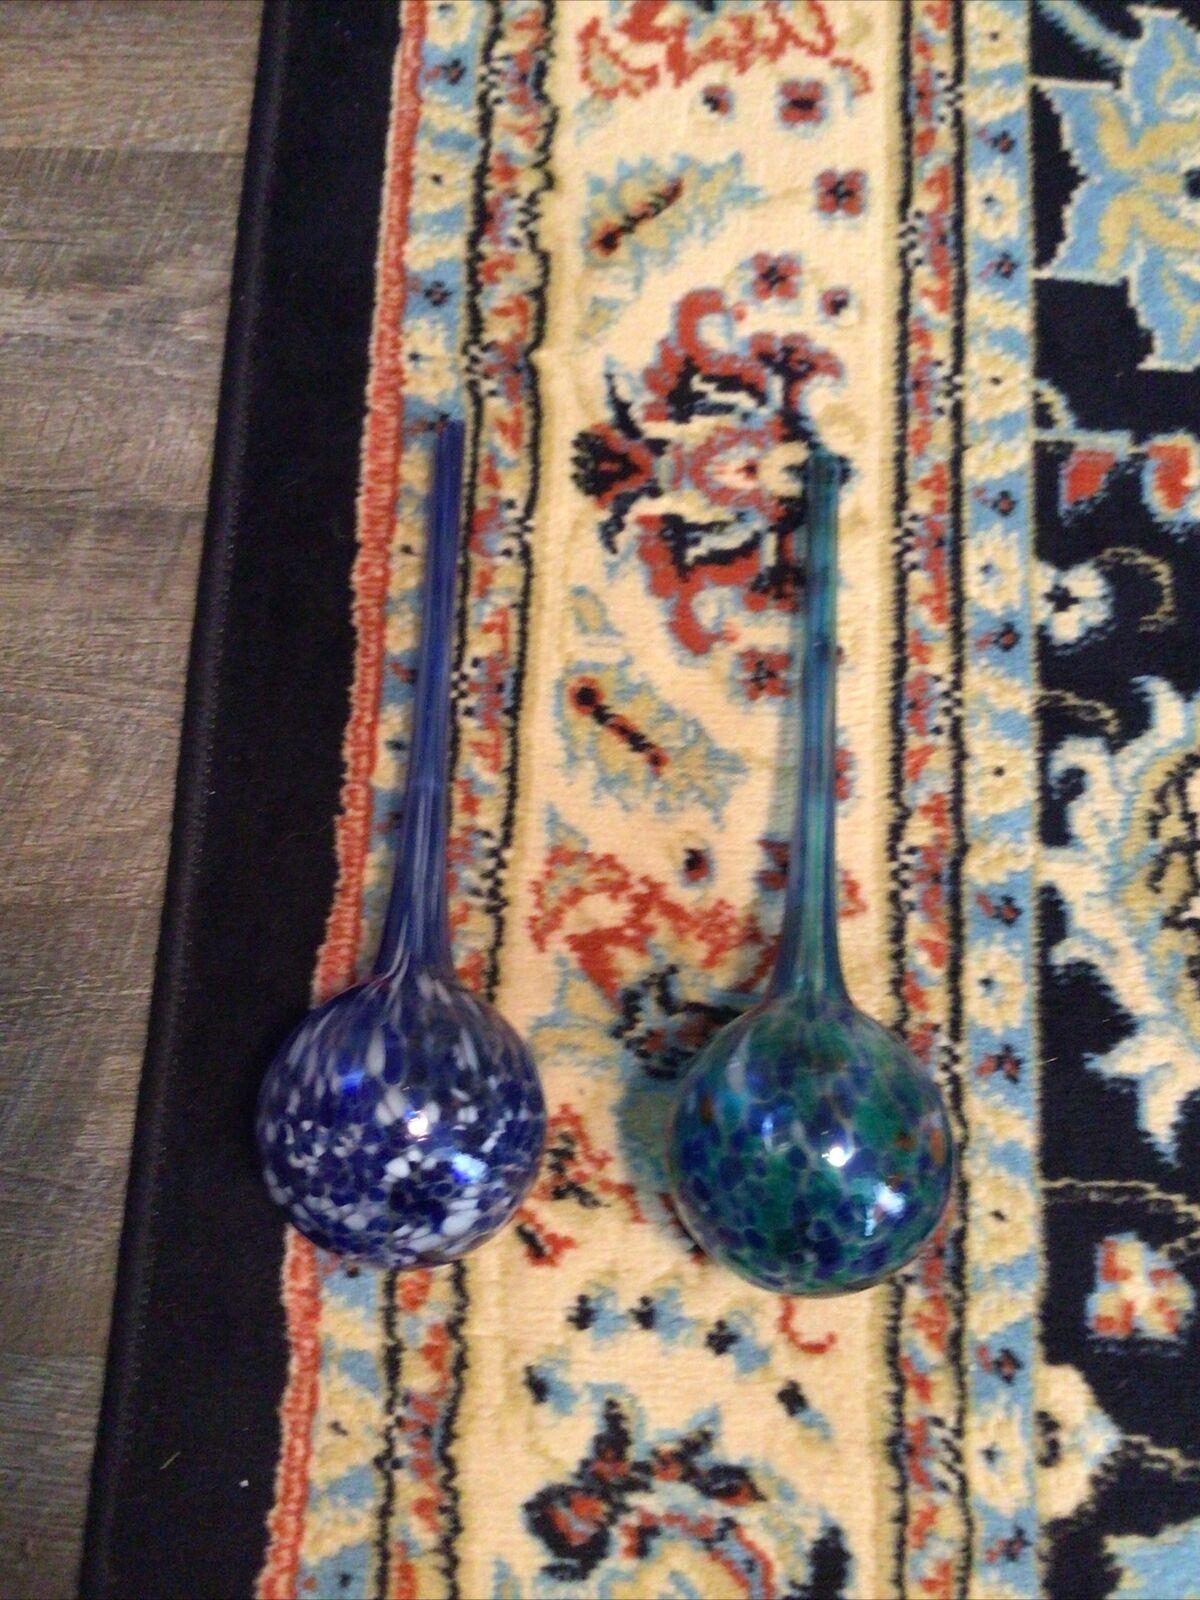 Pair of Glass Watering Bulbs